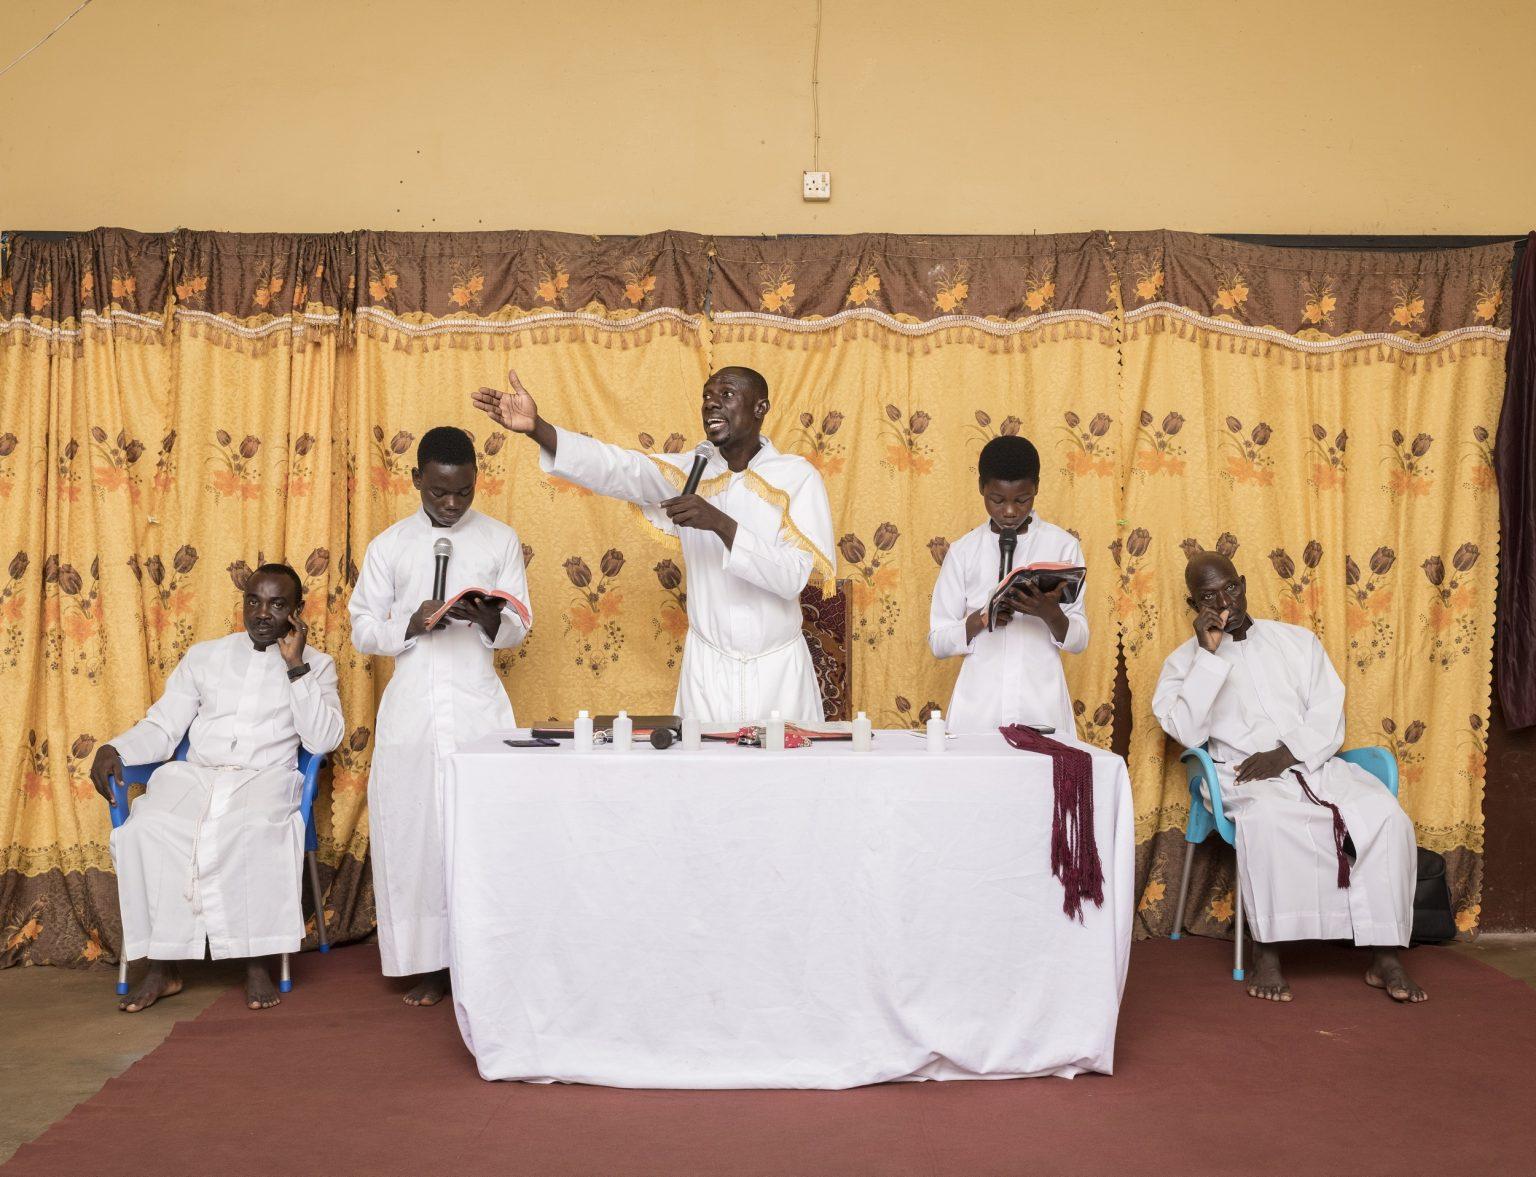 Kumasi, Ashanti Region, Republic of Ghana, April 2019 - The Sunday morning service at the True Betthel Church. ><  Kumasi, Regione Ashanti, Repubblica del Ghana, aprile 2019 - Messa della domenica mattina presso la True Betthel Church.